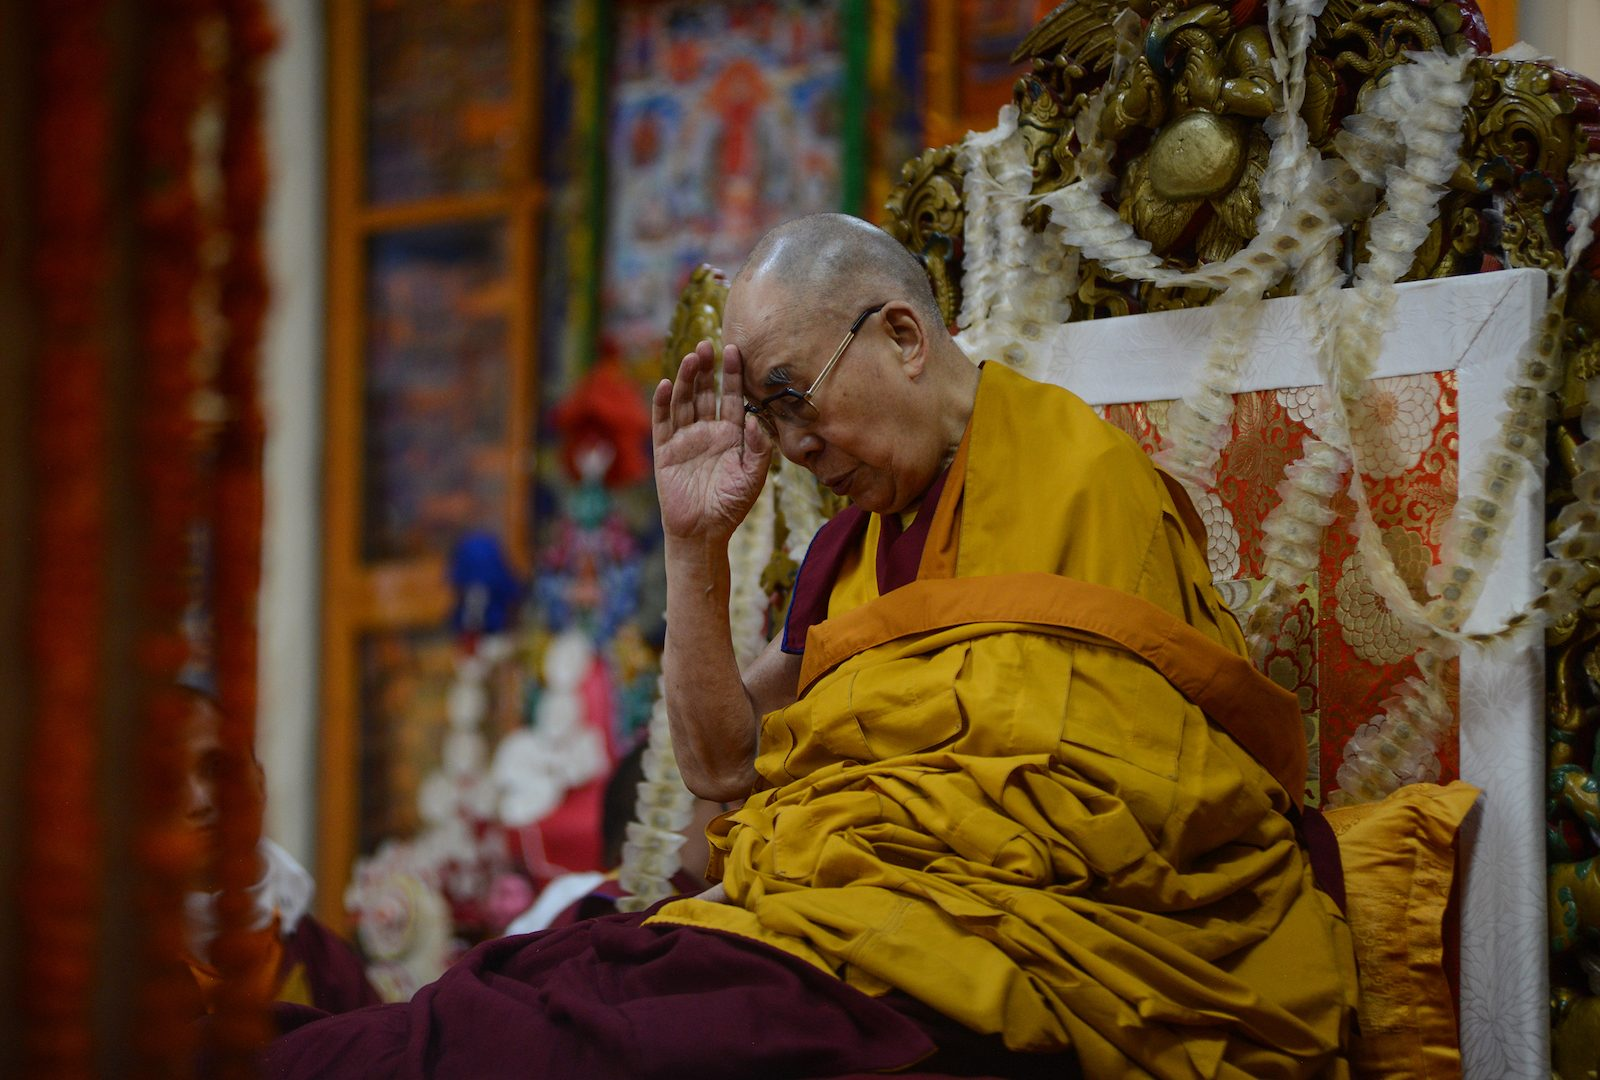 Dalai Lama Breaks The Chains Of Reincarnation Asia Times